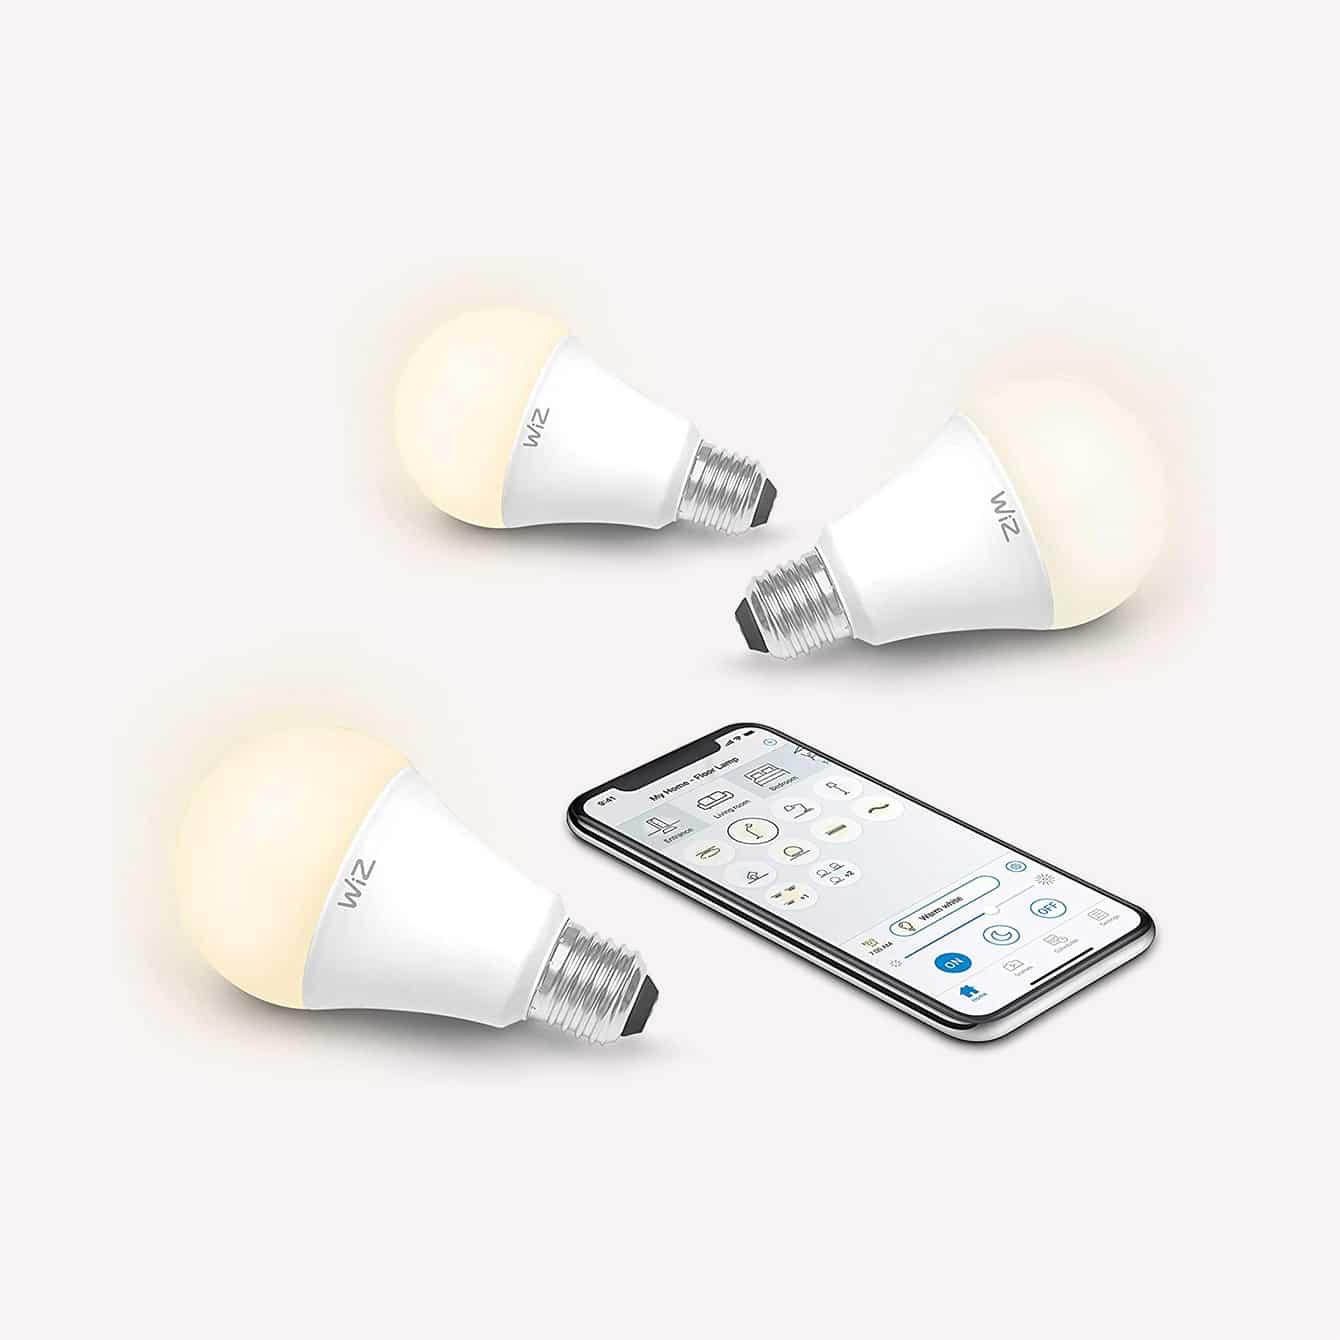 WiZ IZ0026023 60 Watt EQ A19 Smart Wifi Connected LED Light Bulbs